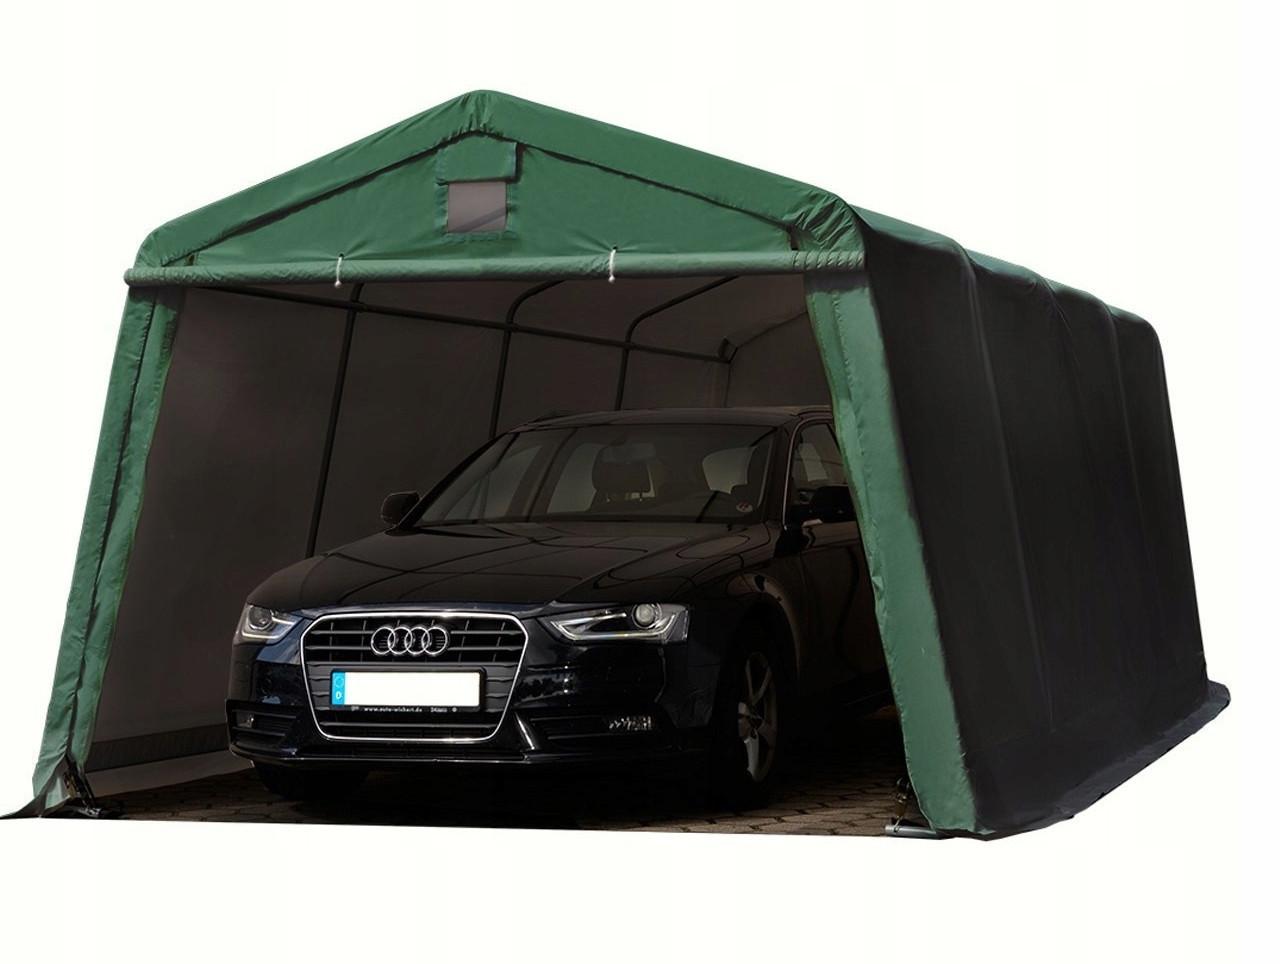 Павильон гаражный 3,3x7,2 м ПВХ 550 г/м² (Зеленый)